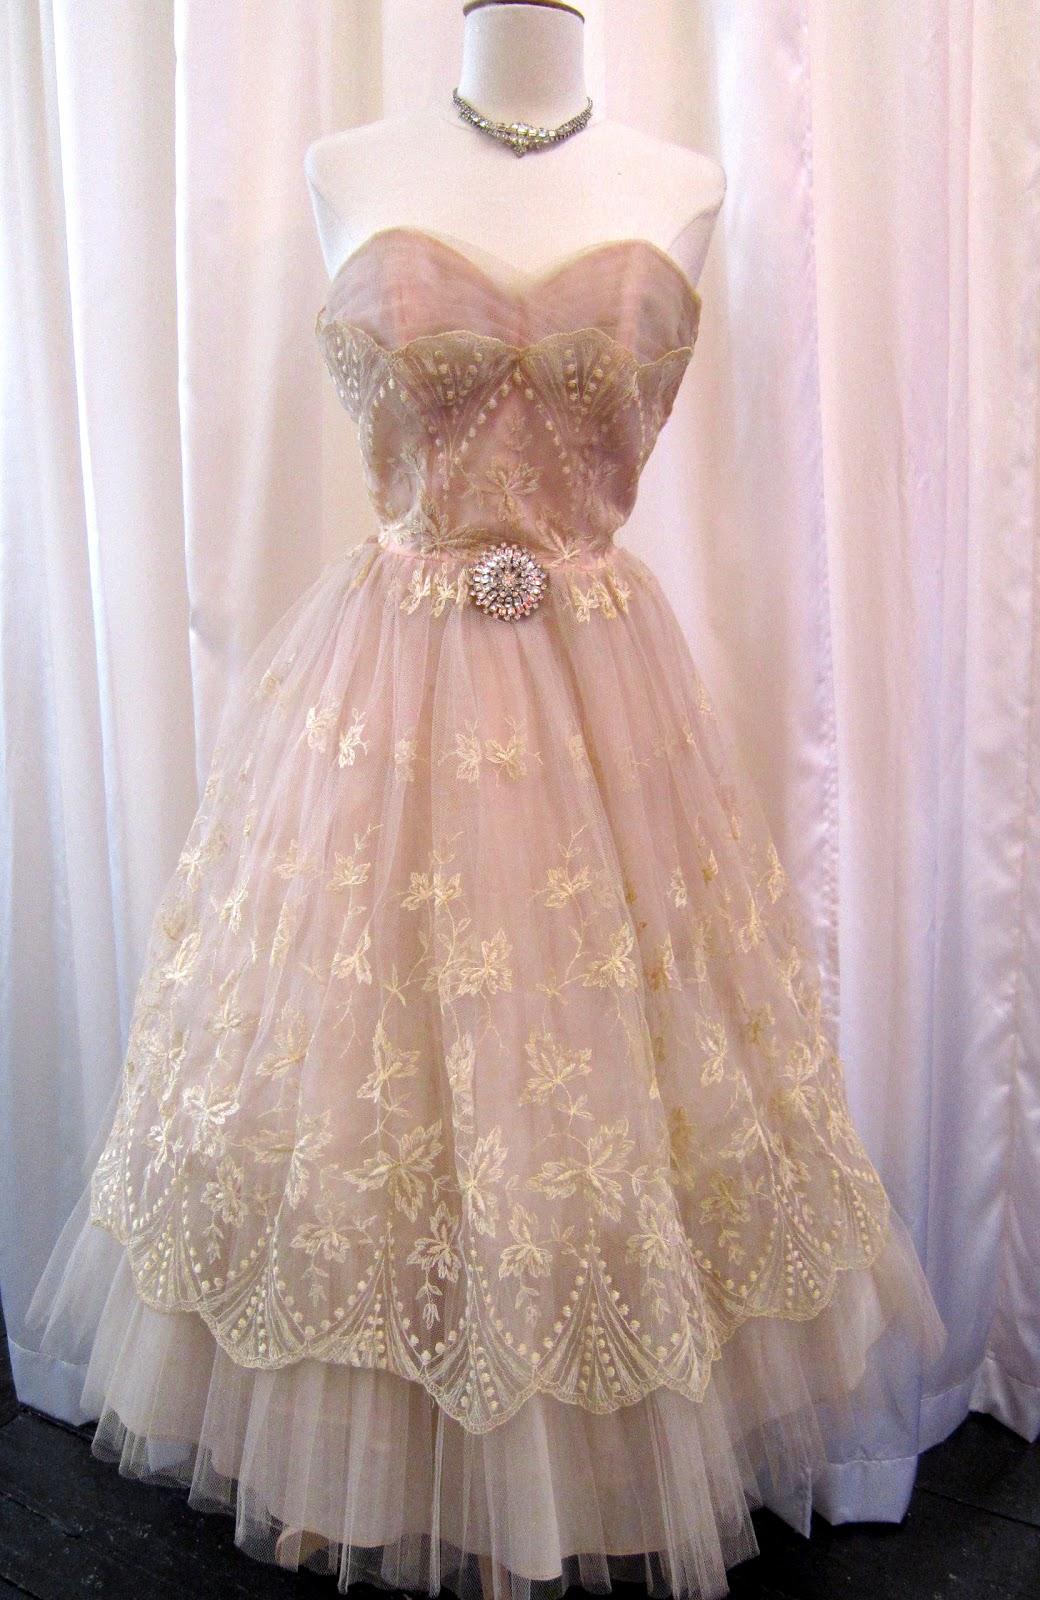 1920s wedding decoration ideas  Rachel Crane champagneblush on Pinterest